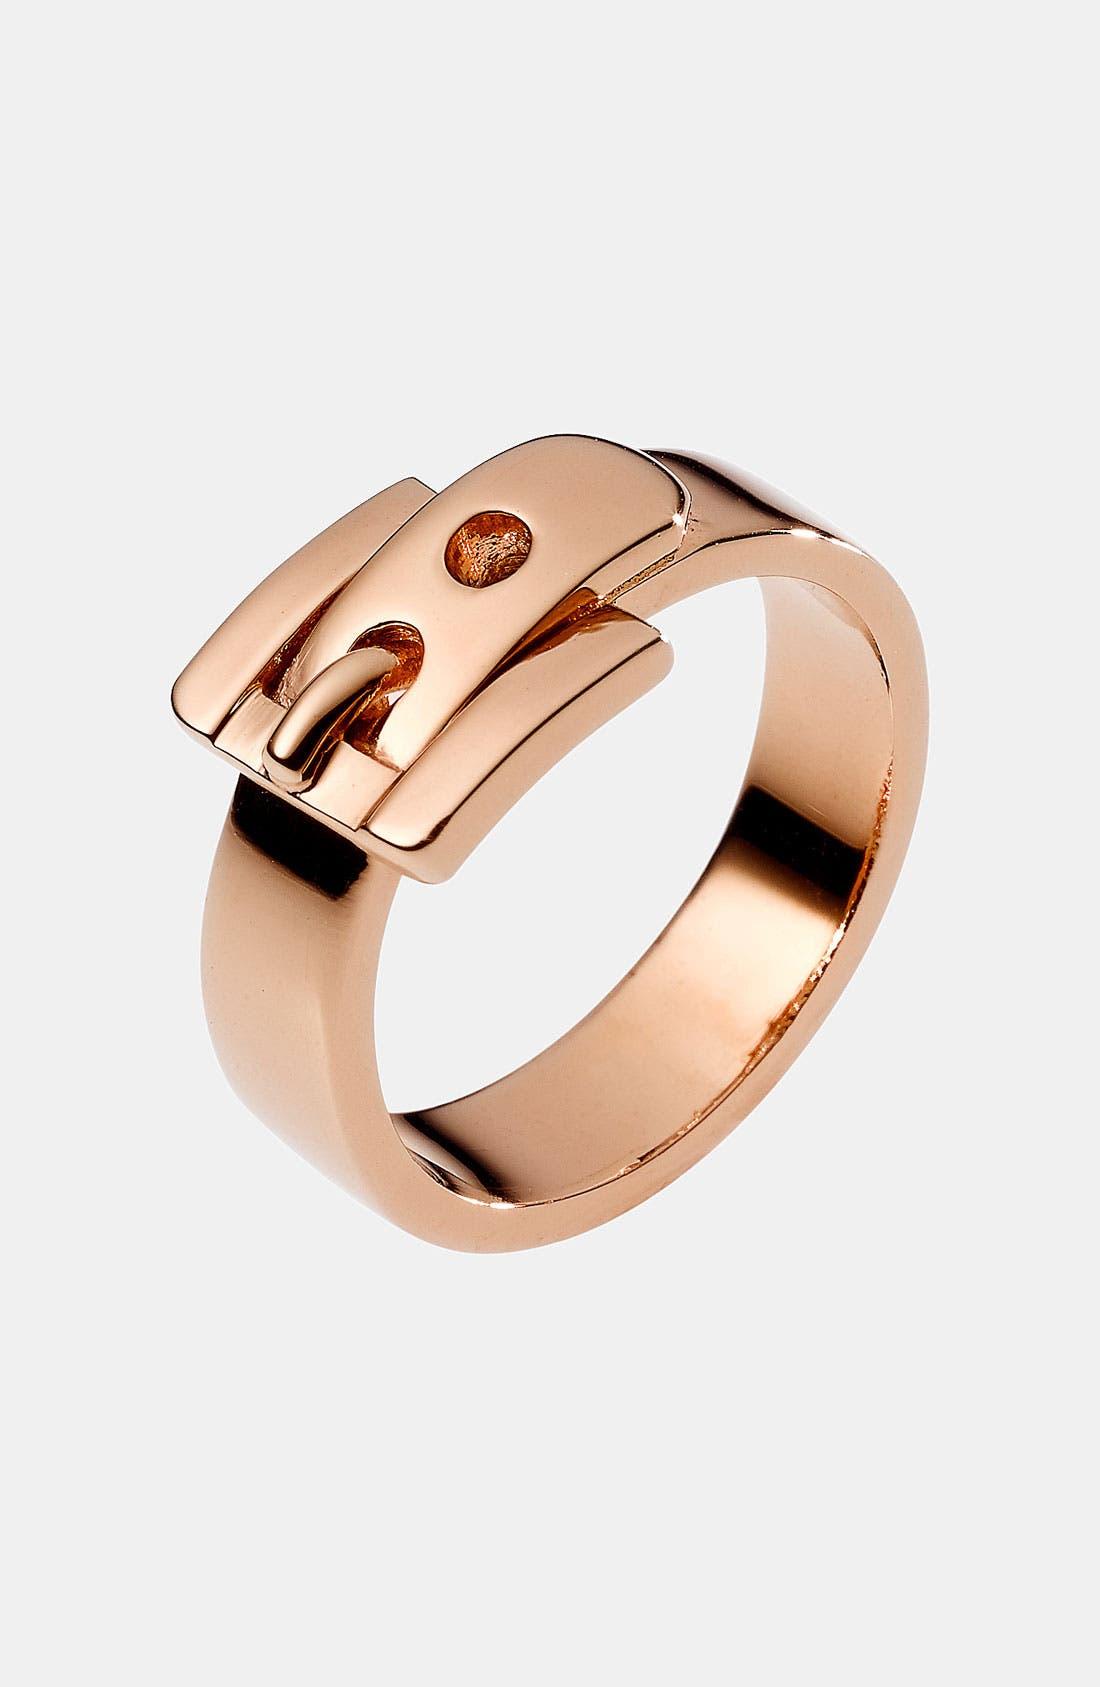 Main Image - Michael Kors Buckle Ring